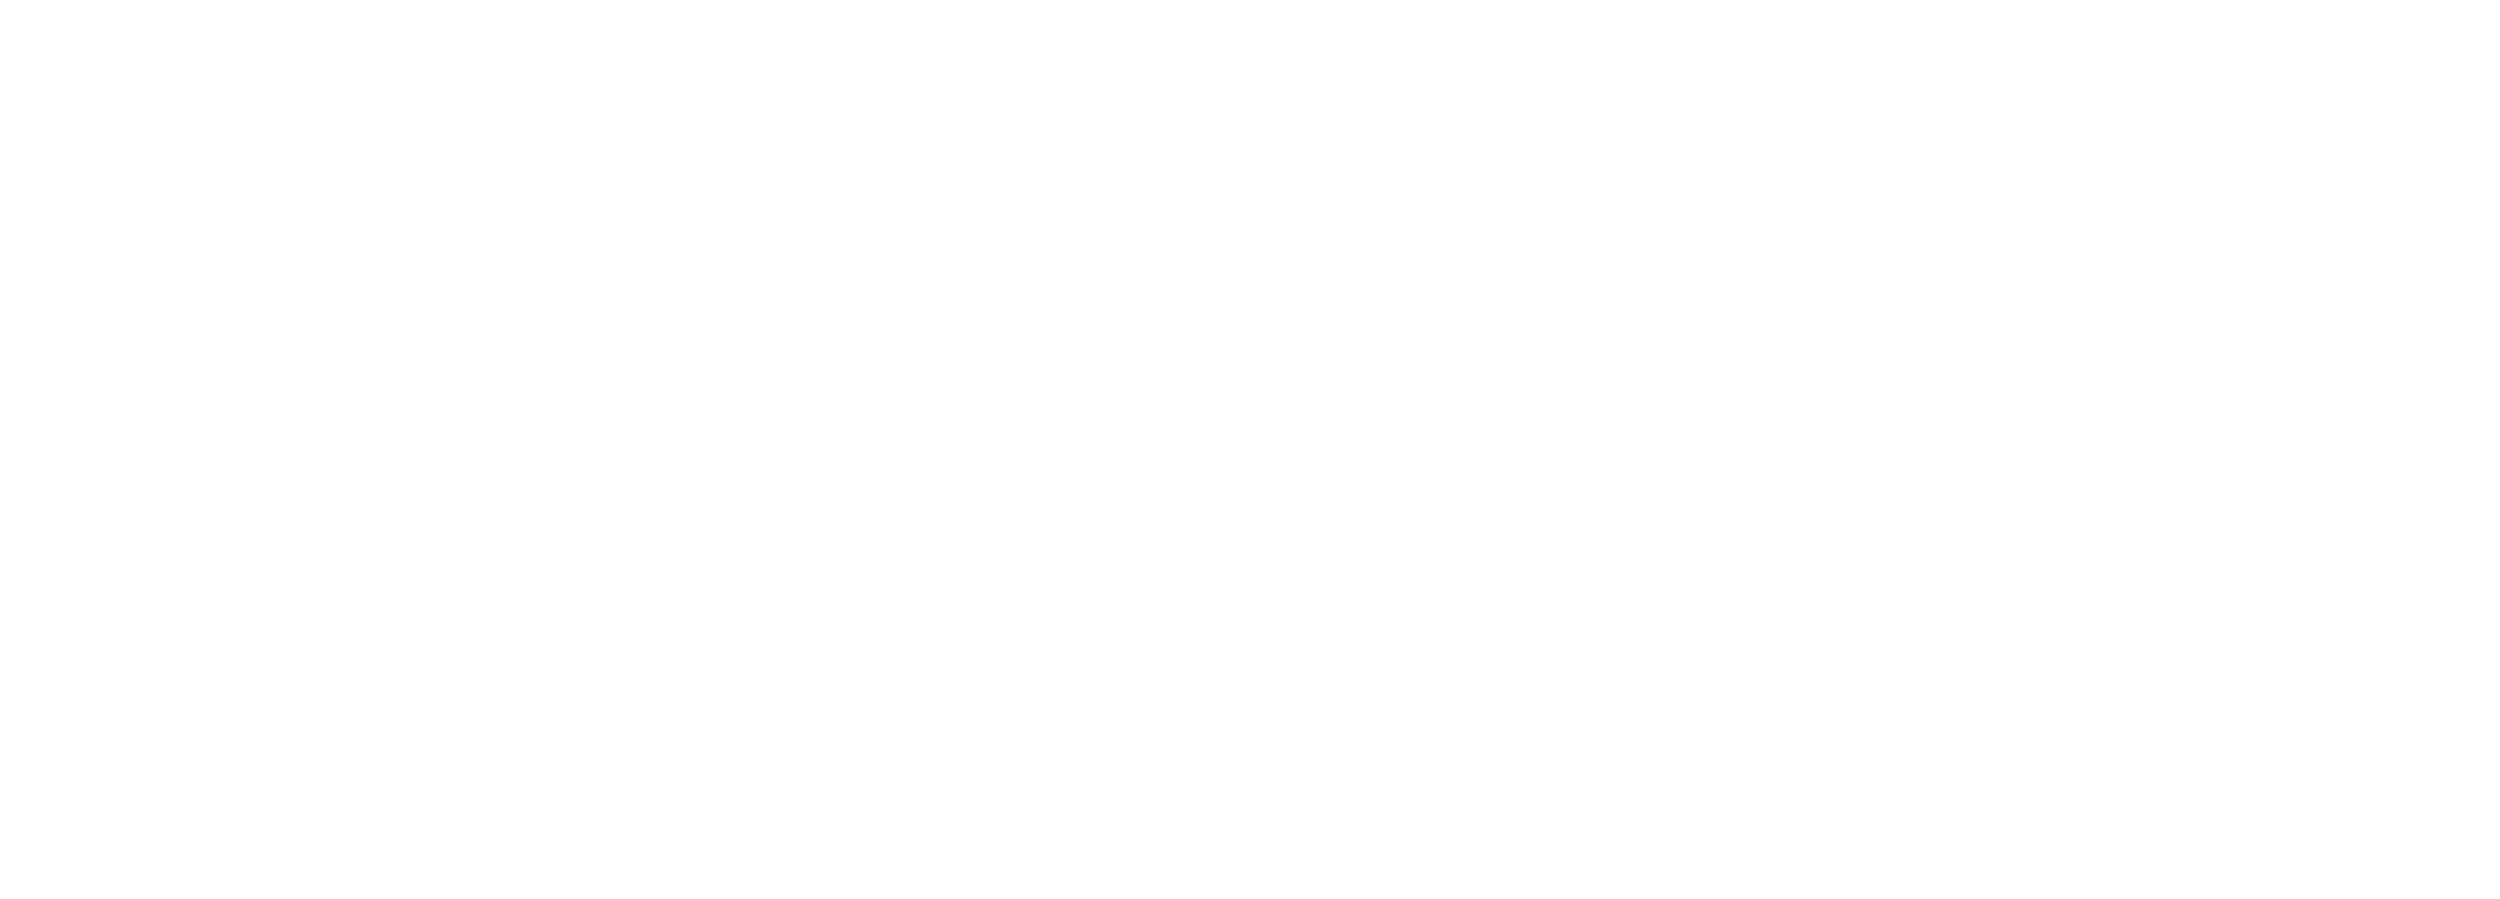 logo-blackside white wide2.png